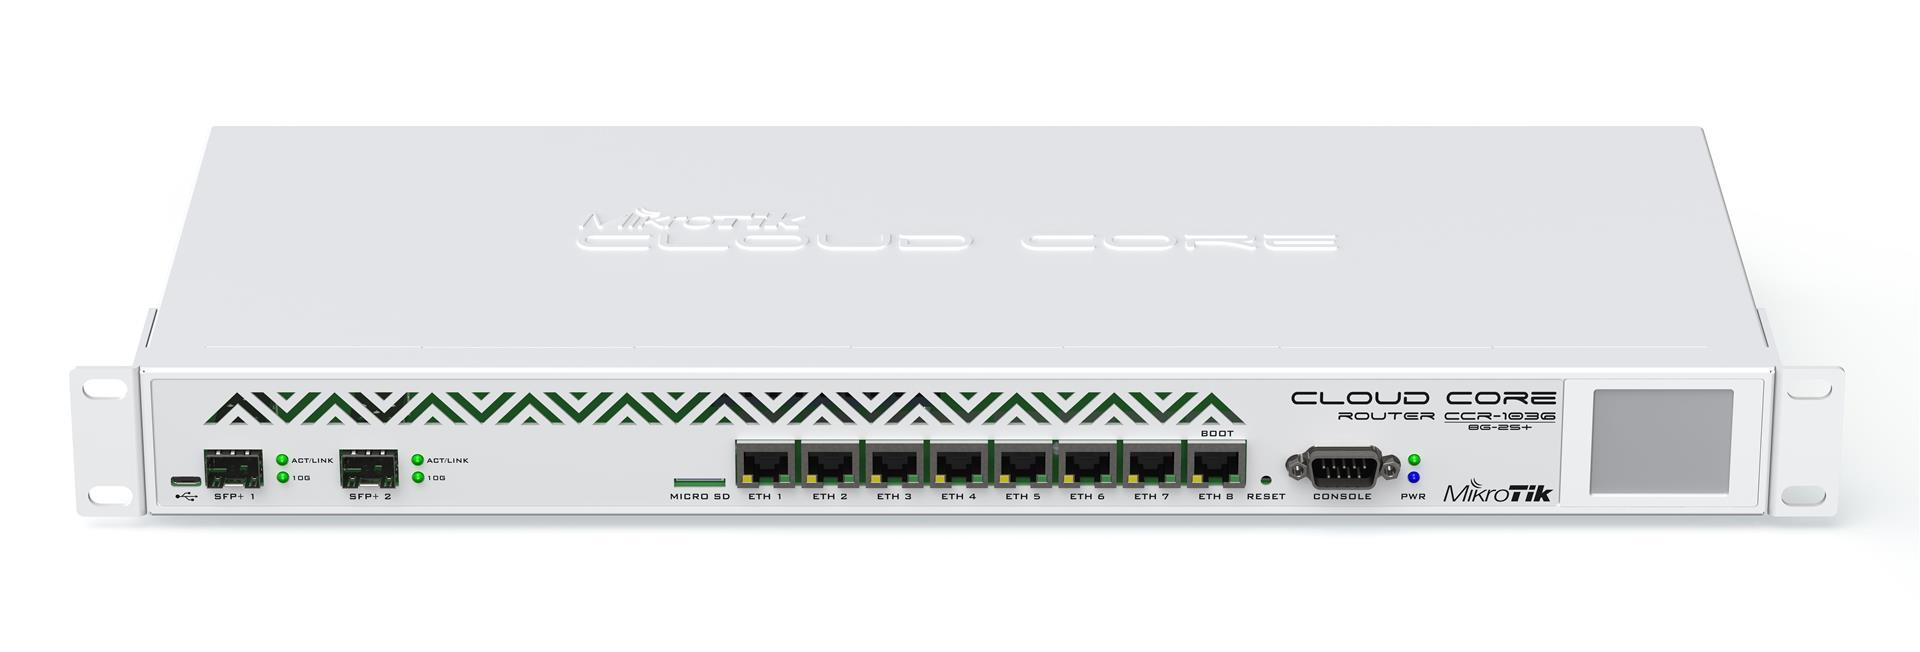 MikroTik CCR1036-8G-2S+EM ROS L6,10G SFP+ - CCR1036-8G-2S+EM